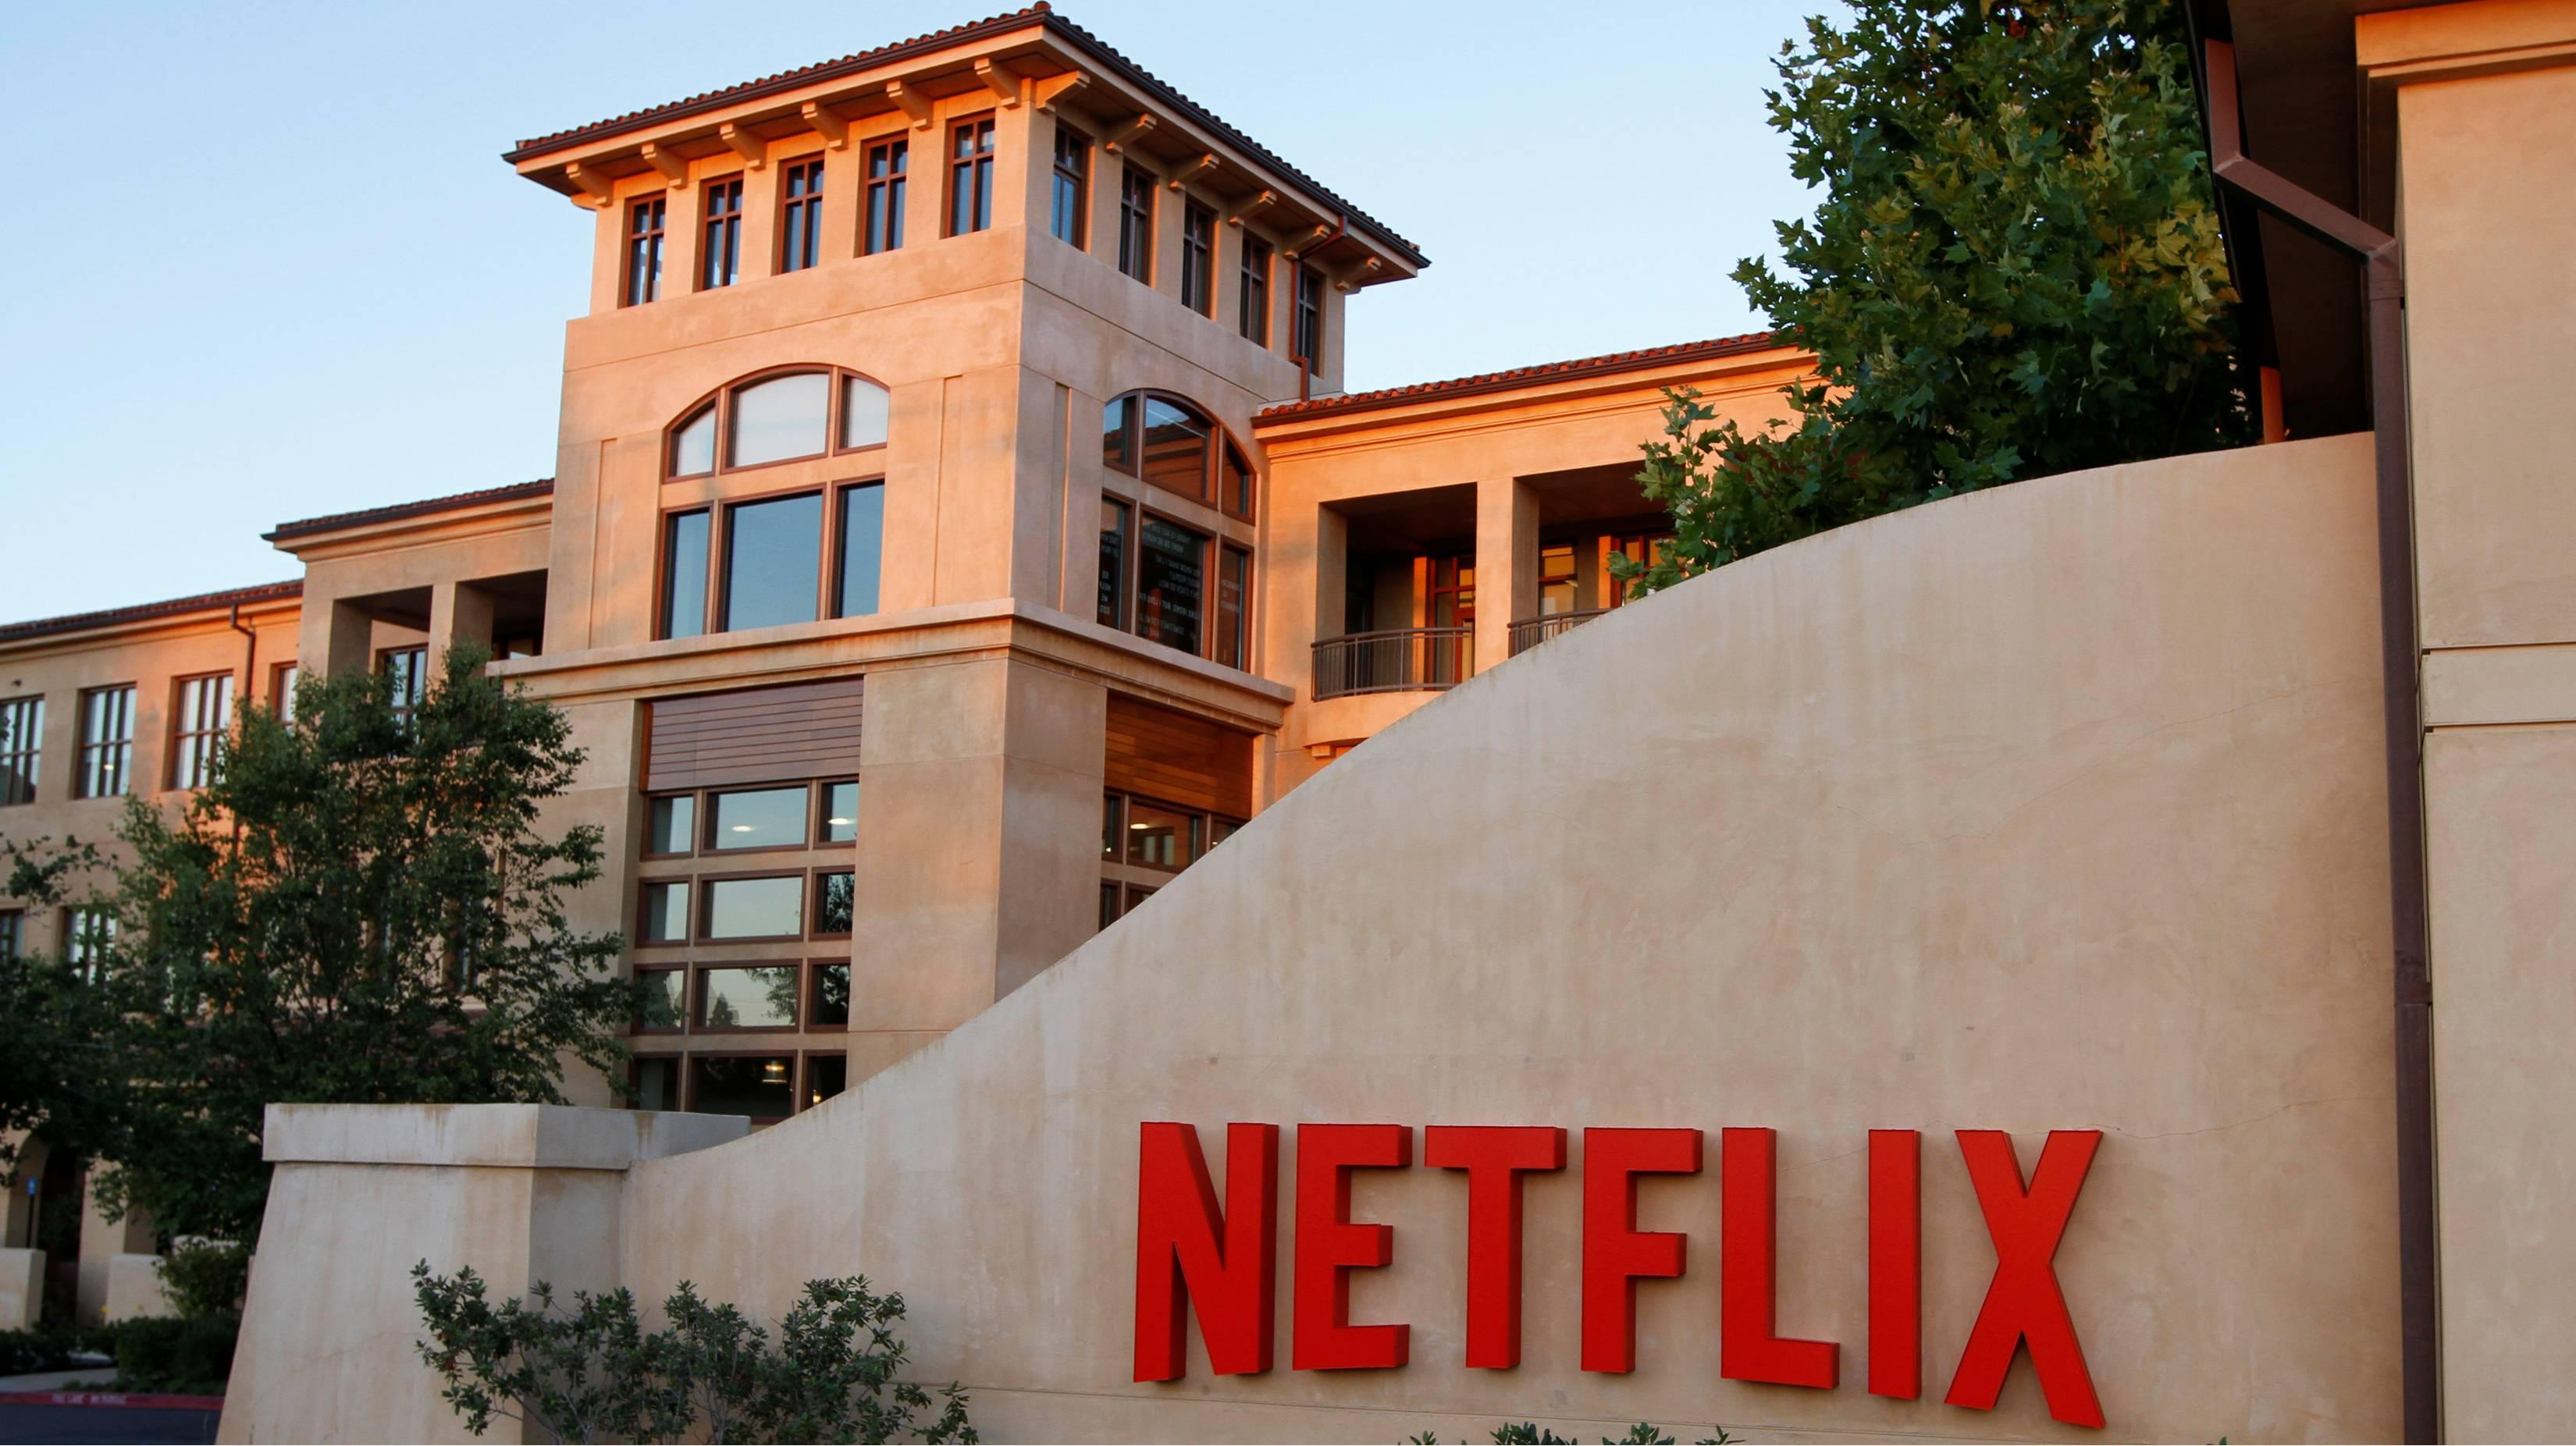 Copied from StreamDaily - Netflix Headquarters